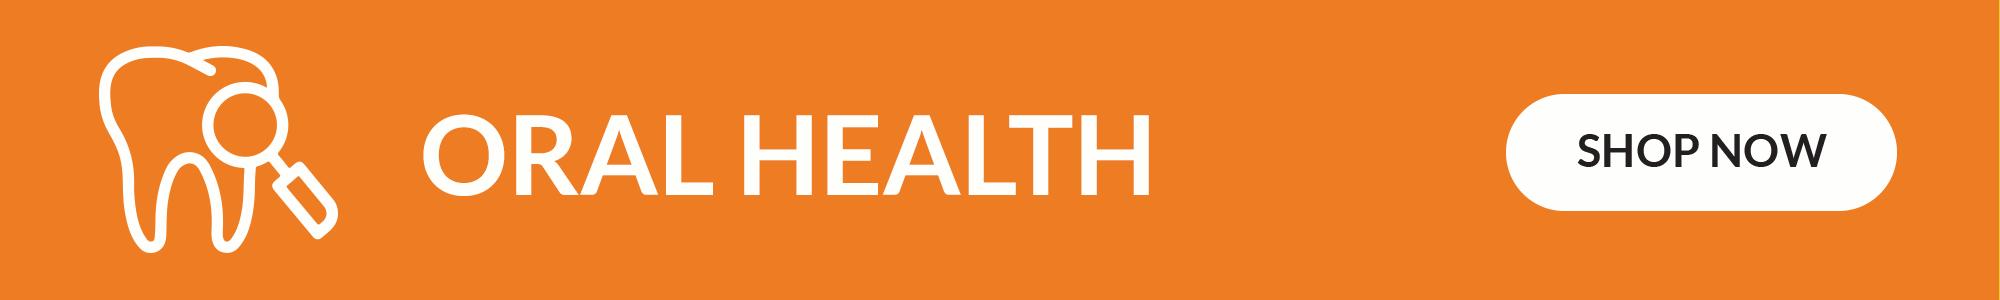 oral-health-header.png